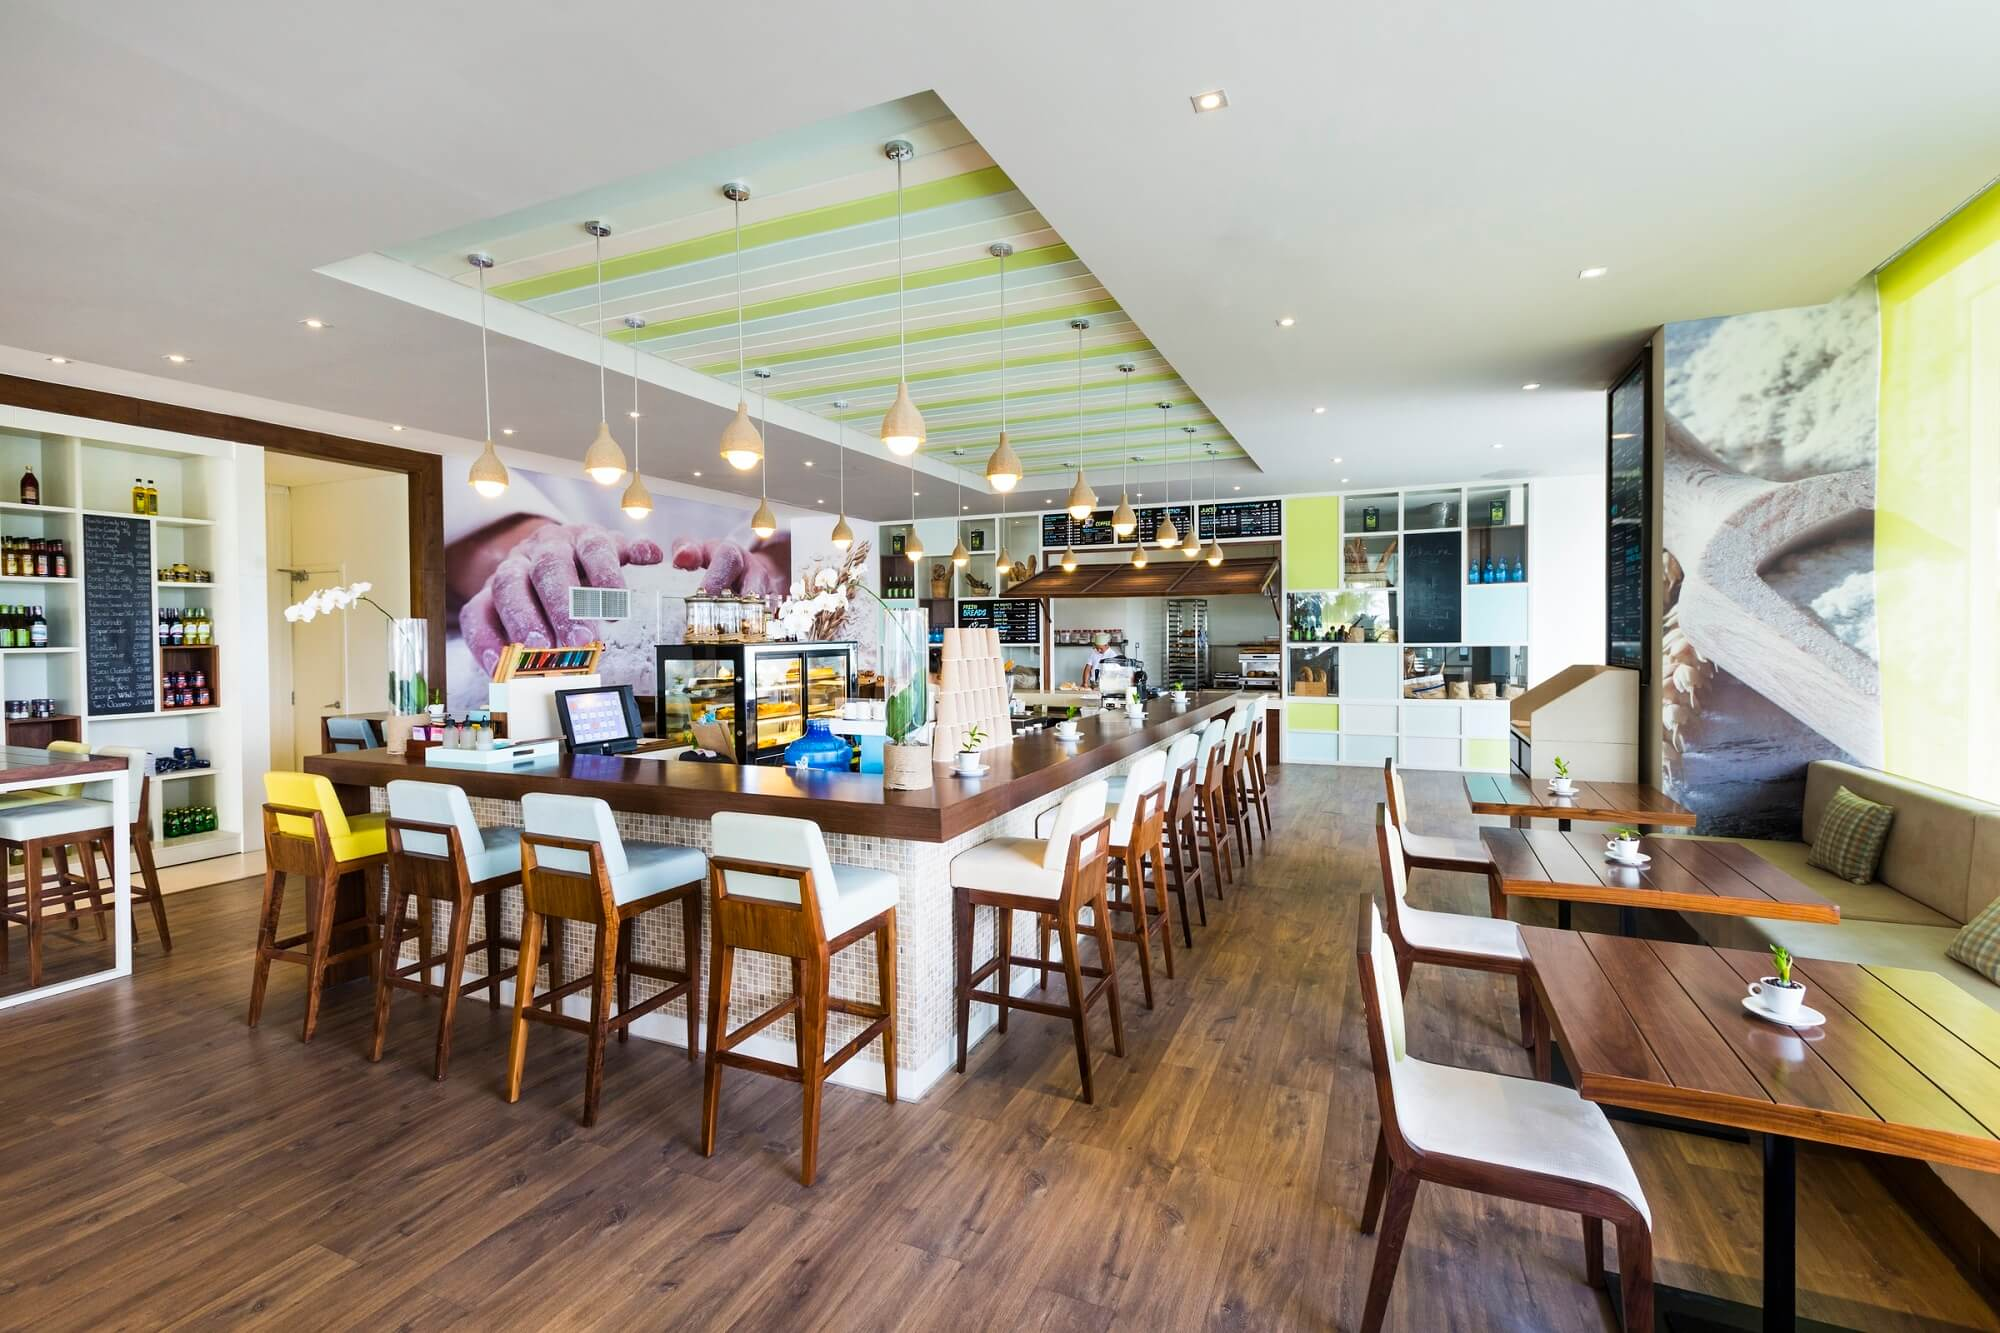 Delicious Cafe Bakery A La Carte Danang Beach Hotel 200 Vo Nguyen Giap Danang Fantasticity Com 01